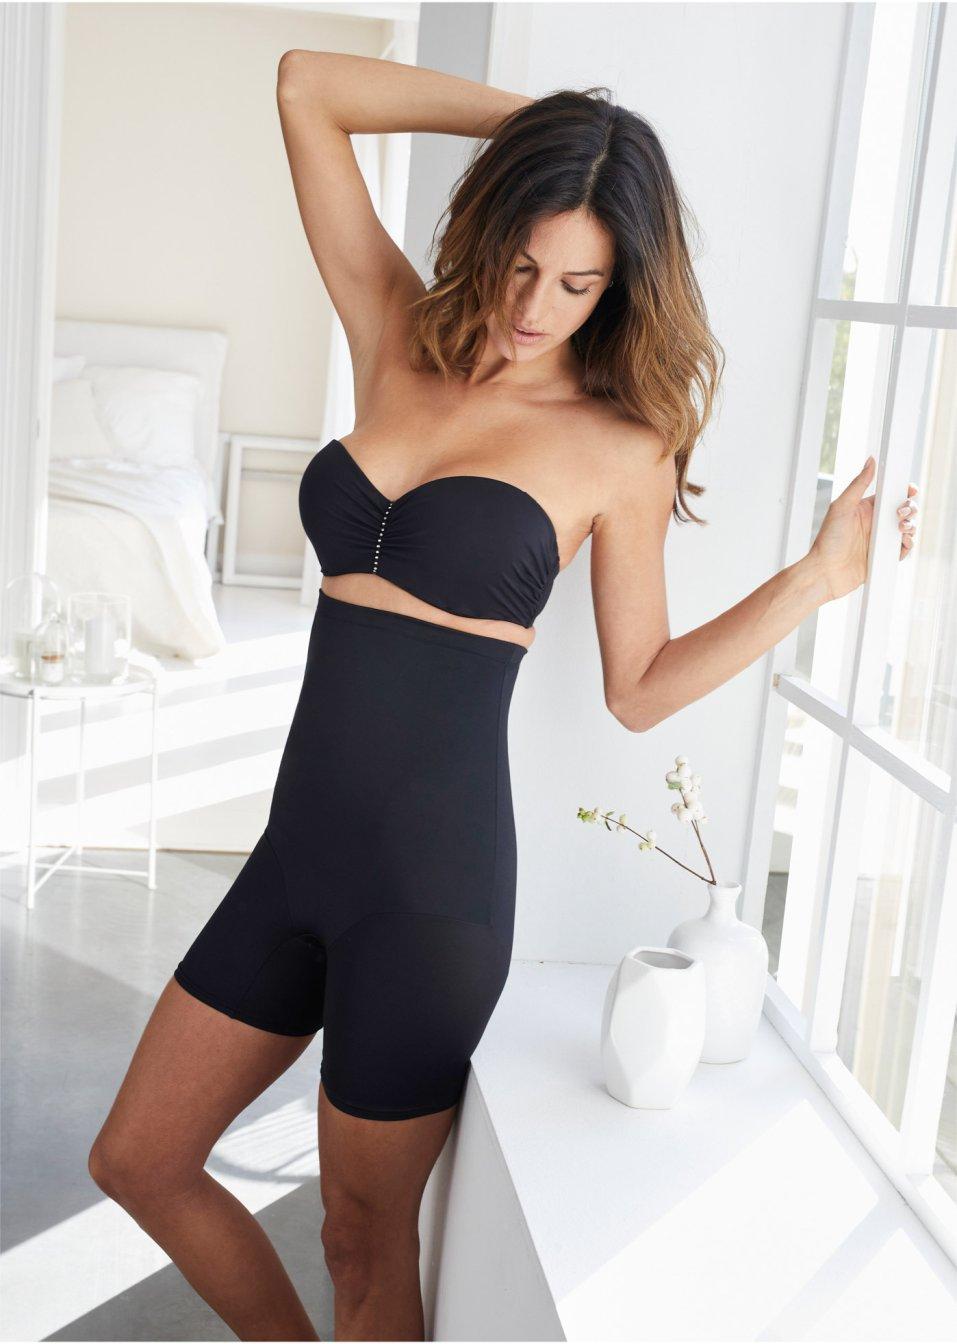 multiway-bhs: passend für jedes outfit bei bonprix